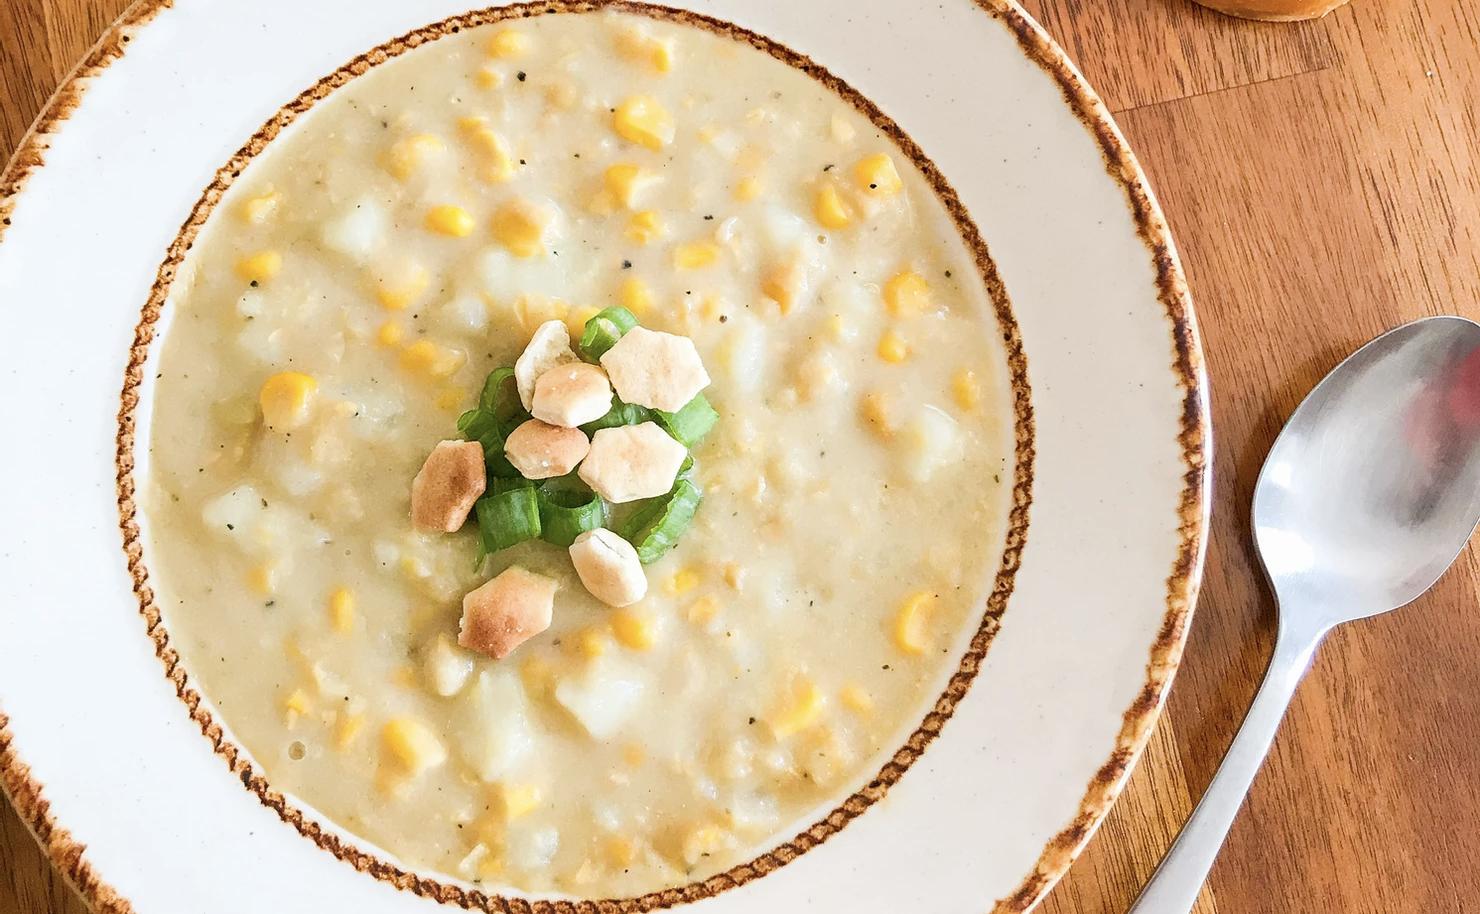 Vegan The Best Corn and Potato Chowder